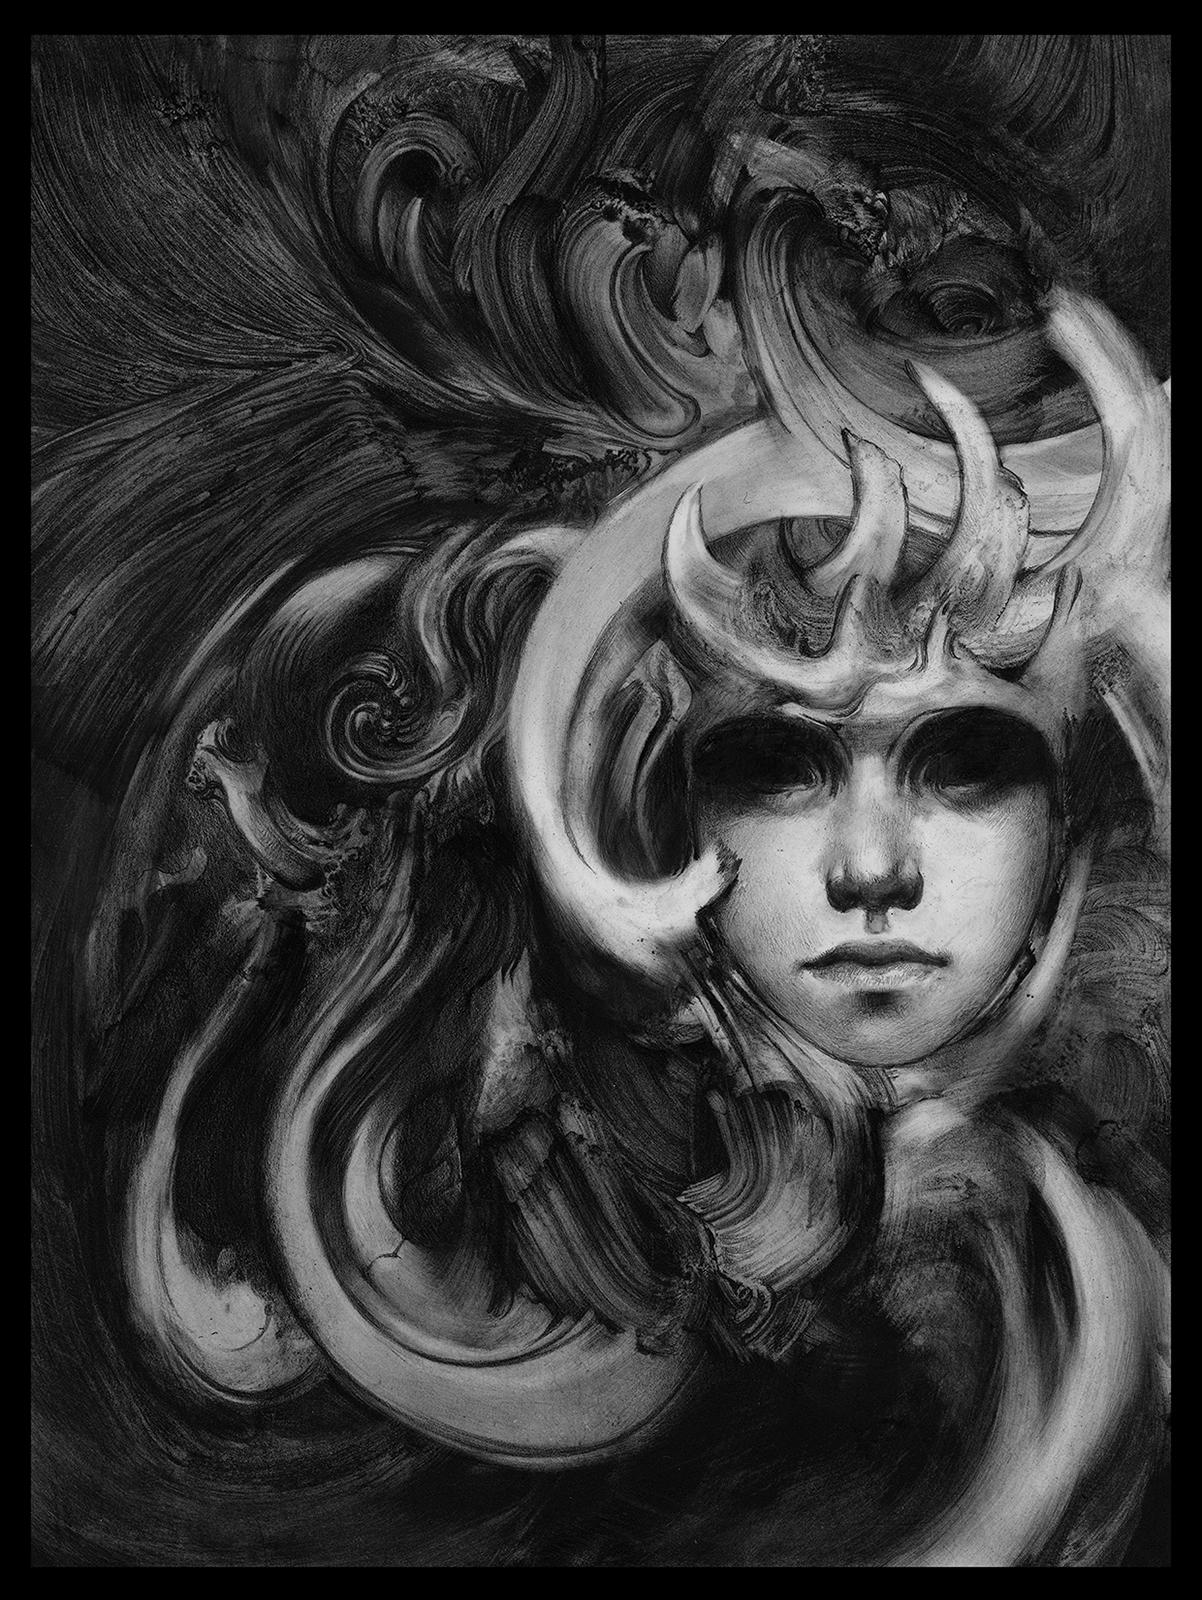 AllenWilliams_The Black Lotus.jpg